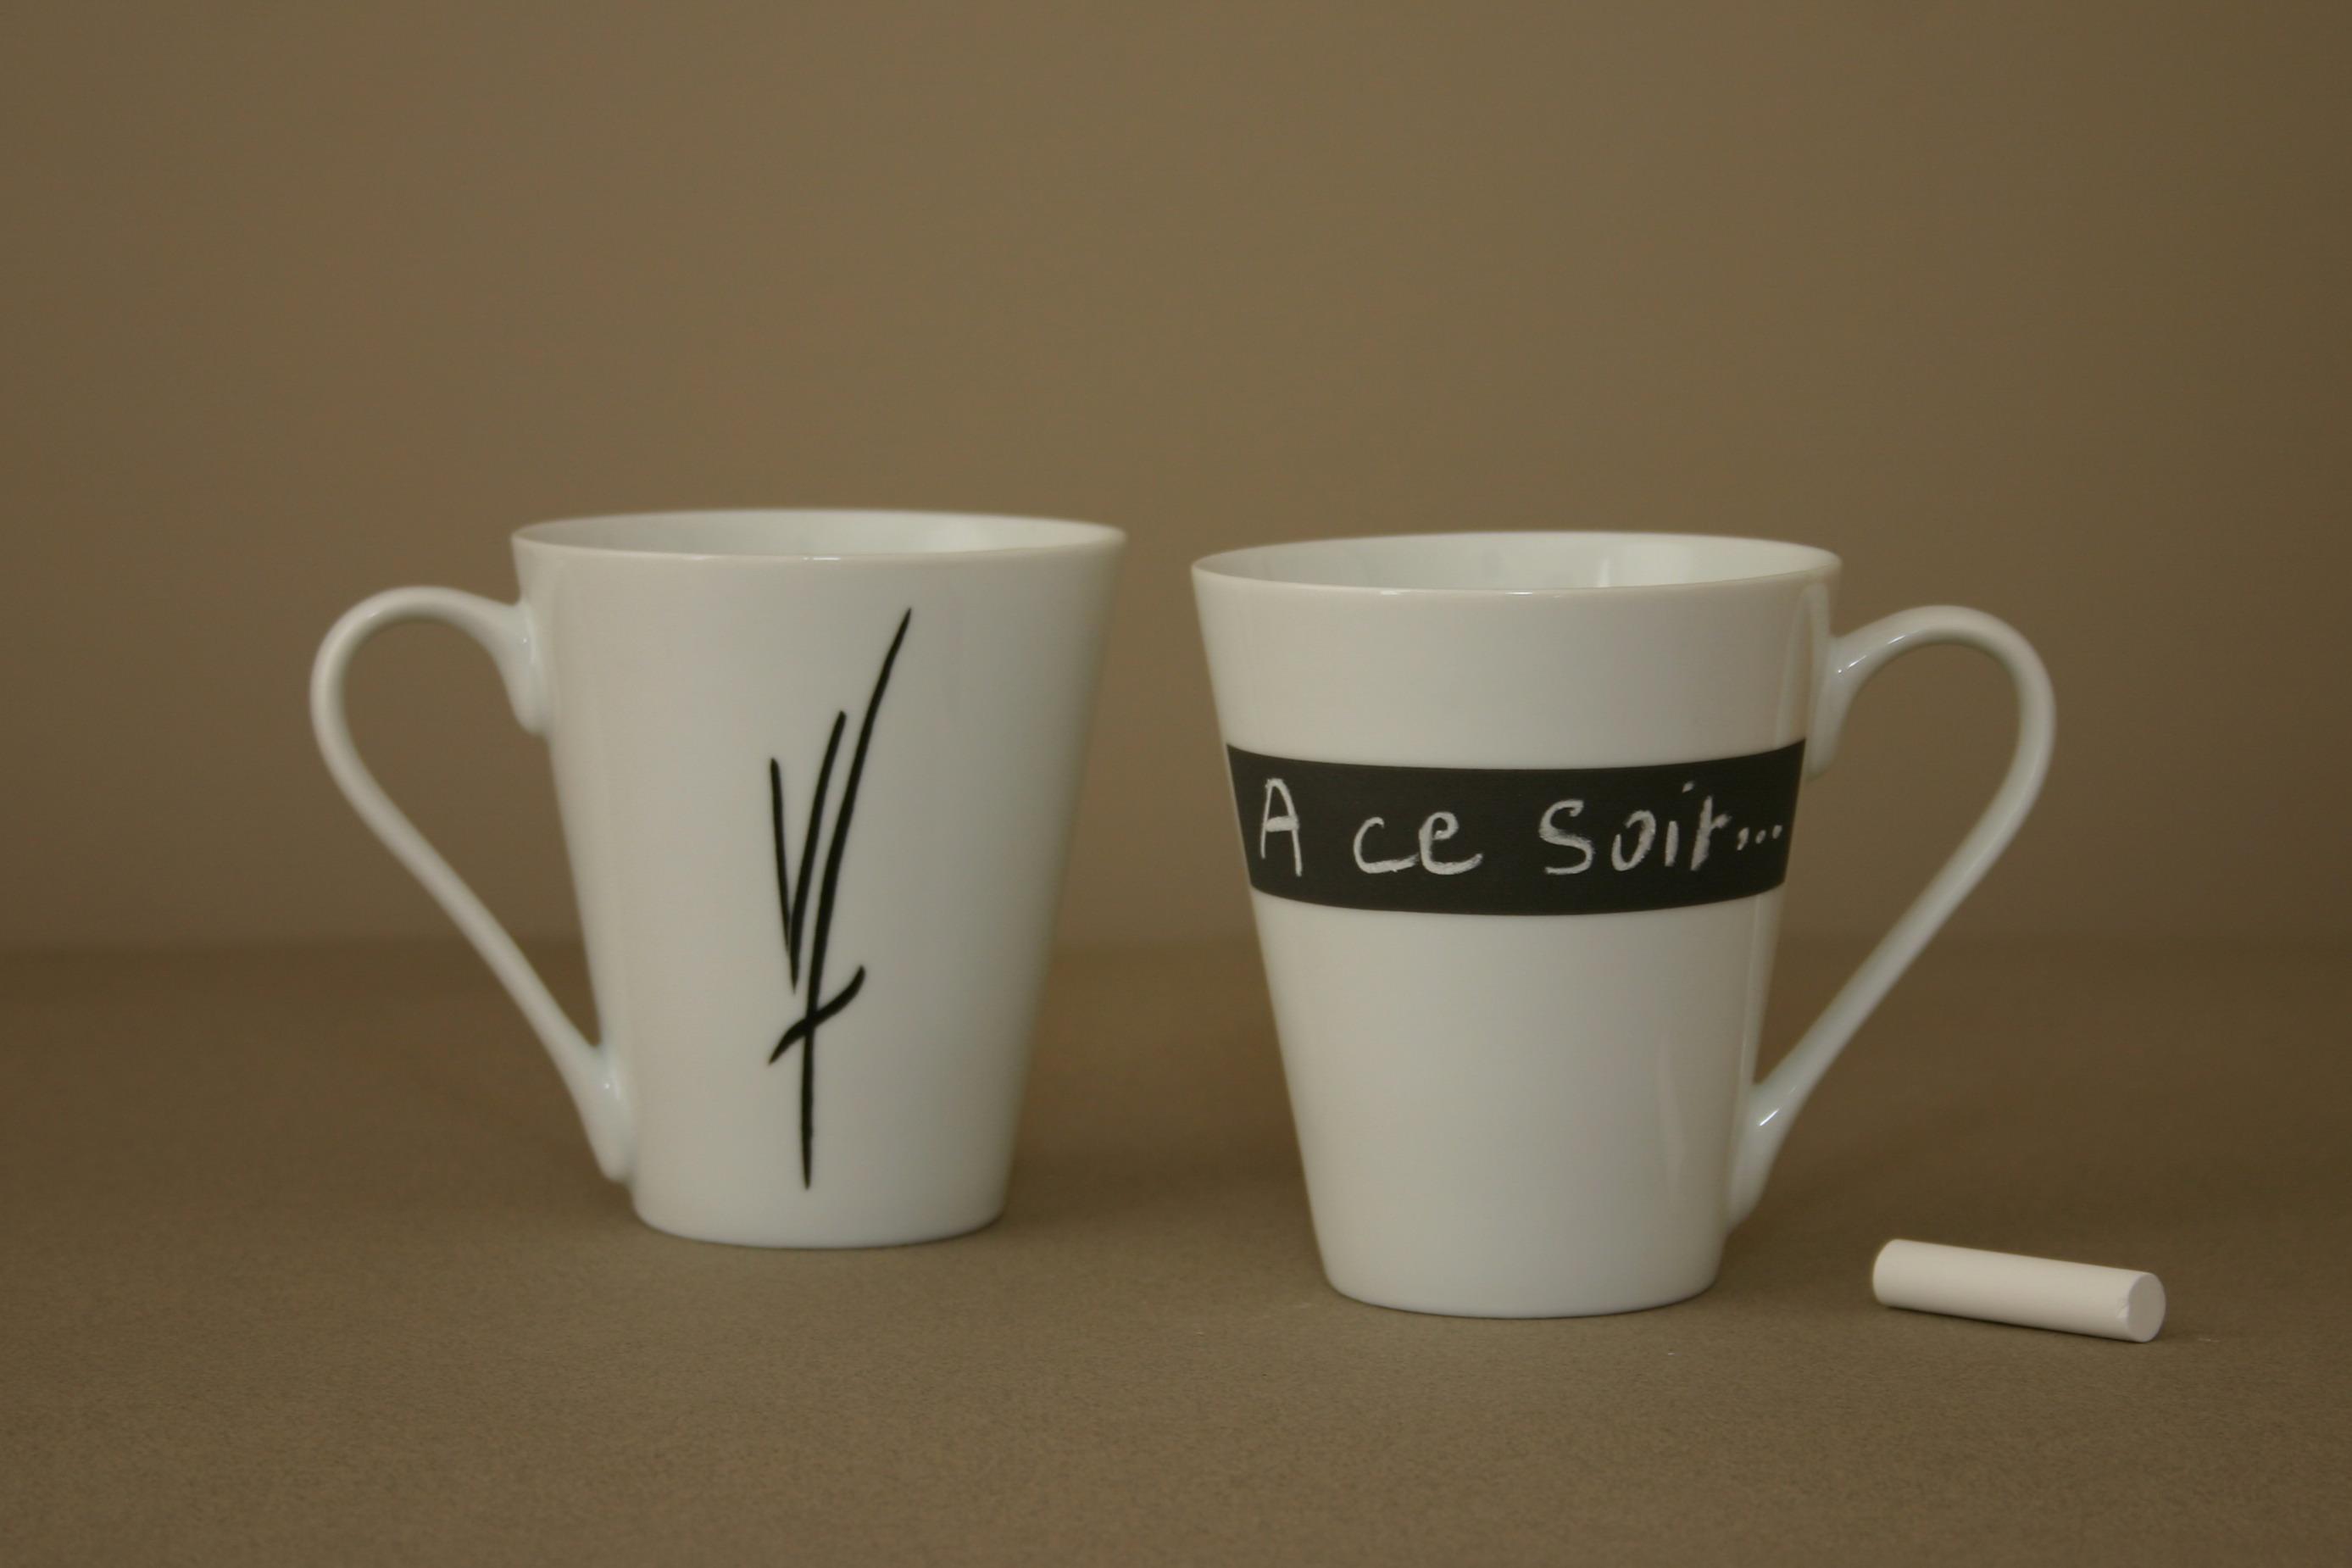 tasses et mugs tous les fournisseurs tasse tasse. Black Bedroom Furniture Sets. Home Design Ideas